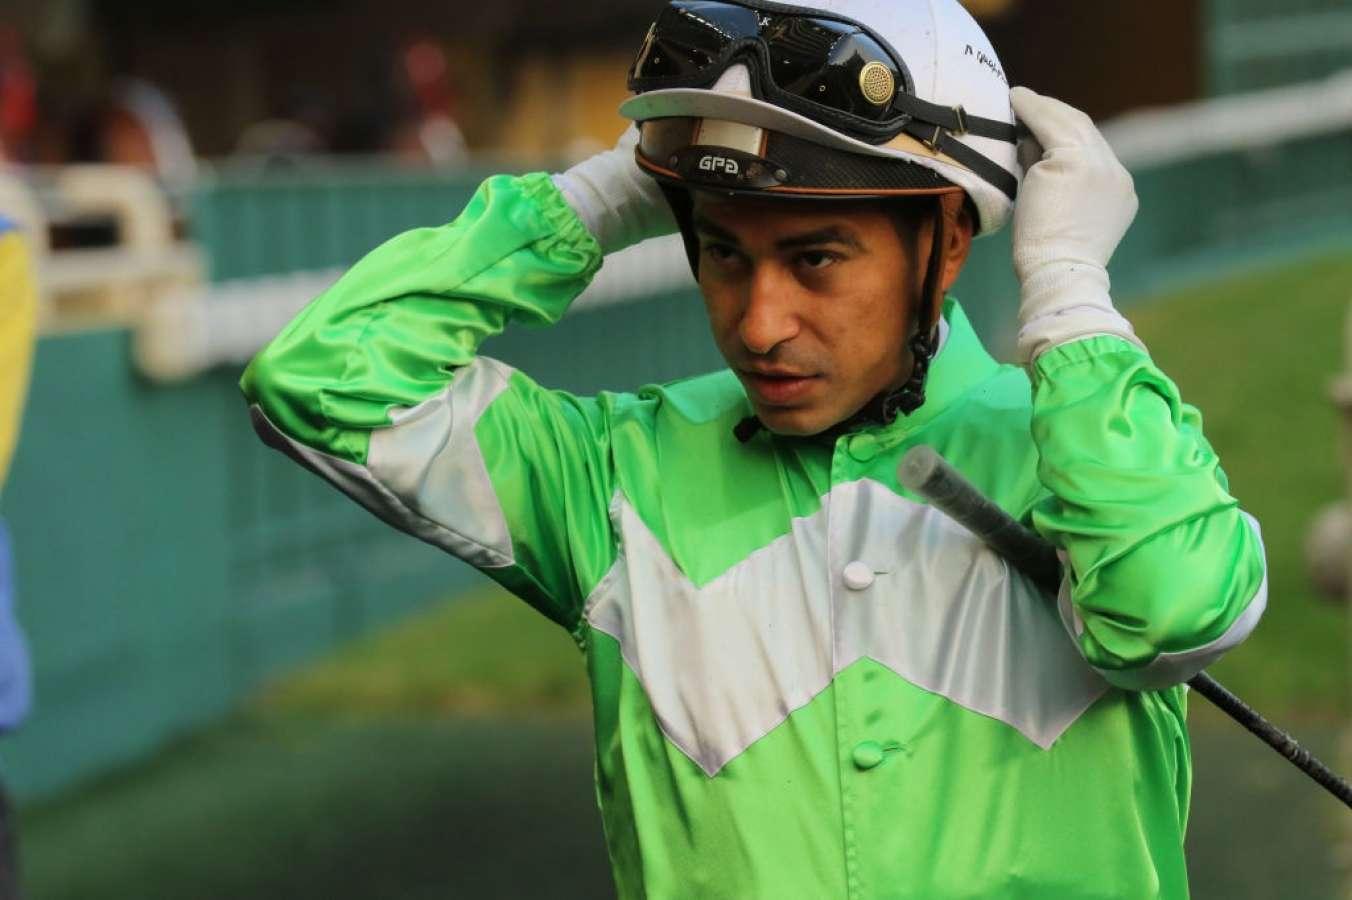 Mauritian jockey Nooresh Juglall dies in race fall